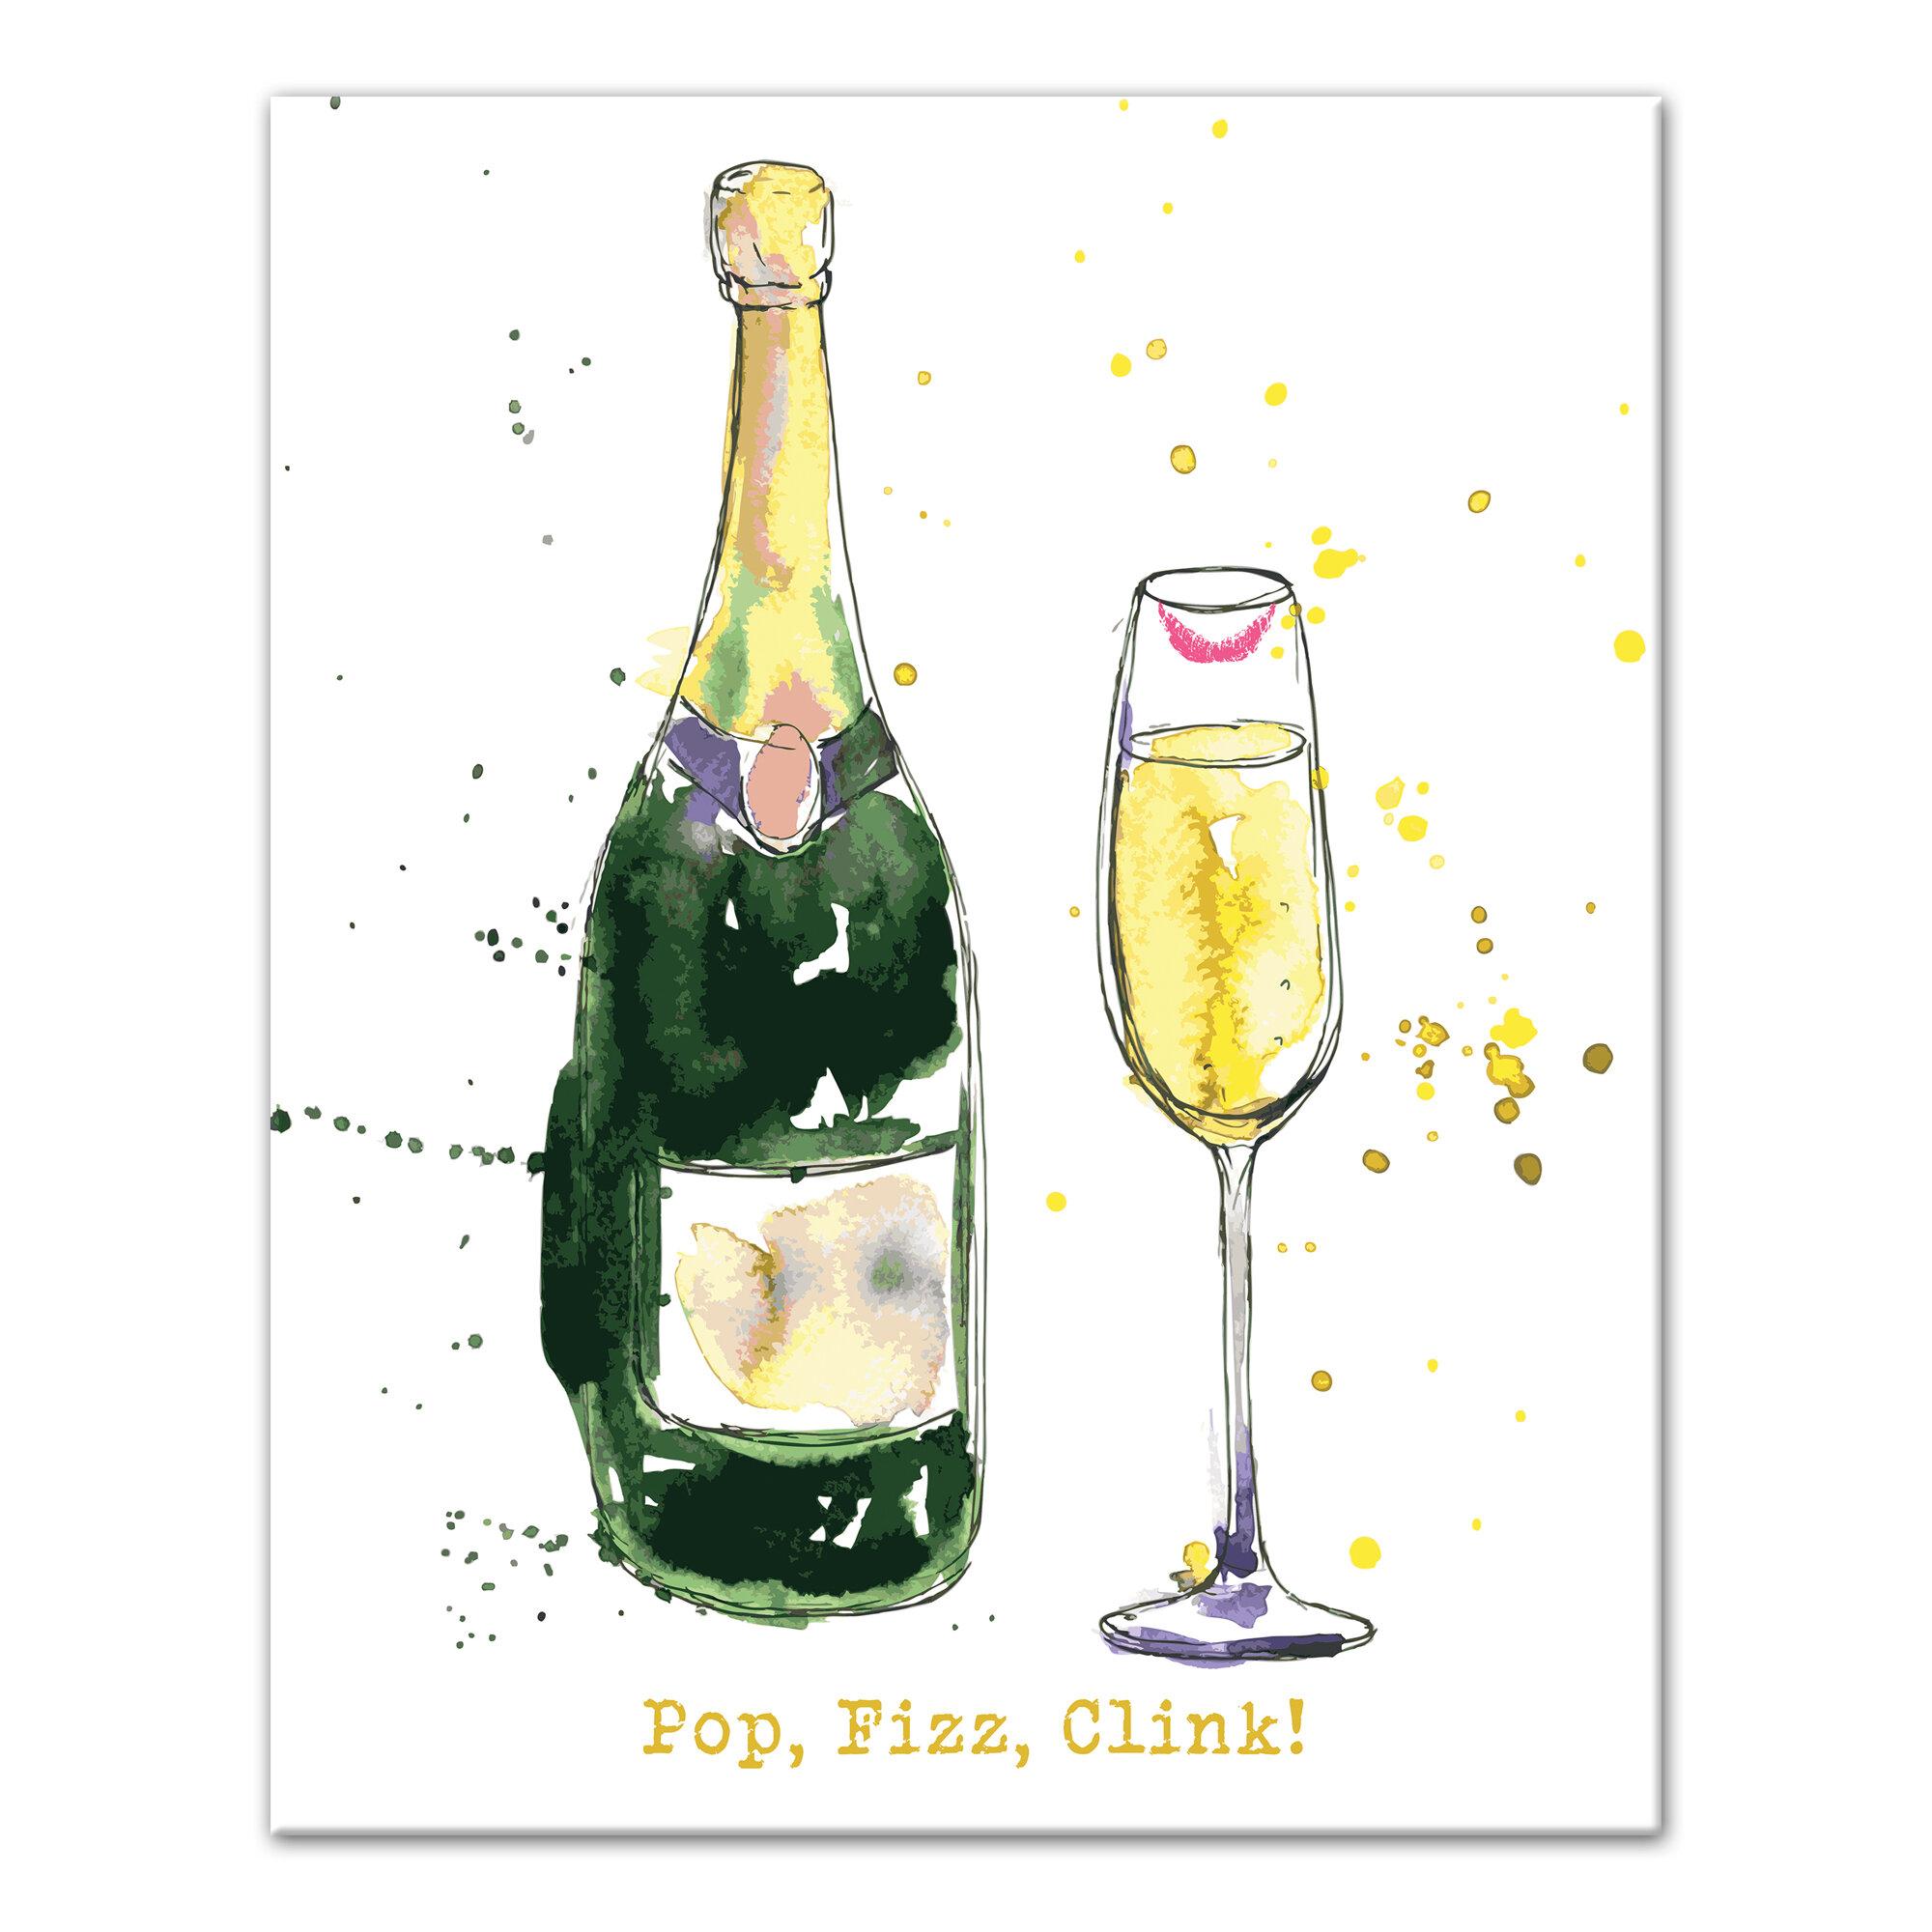 House Of Hampton Pop Fizz Clink Champagne Graphic Art Print On Canvas Wayfair